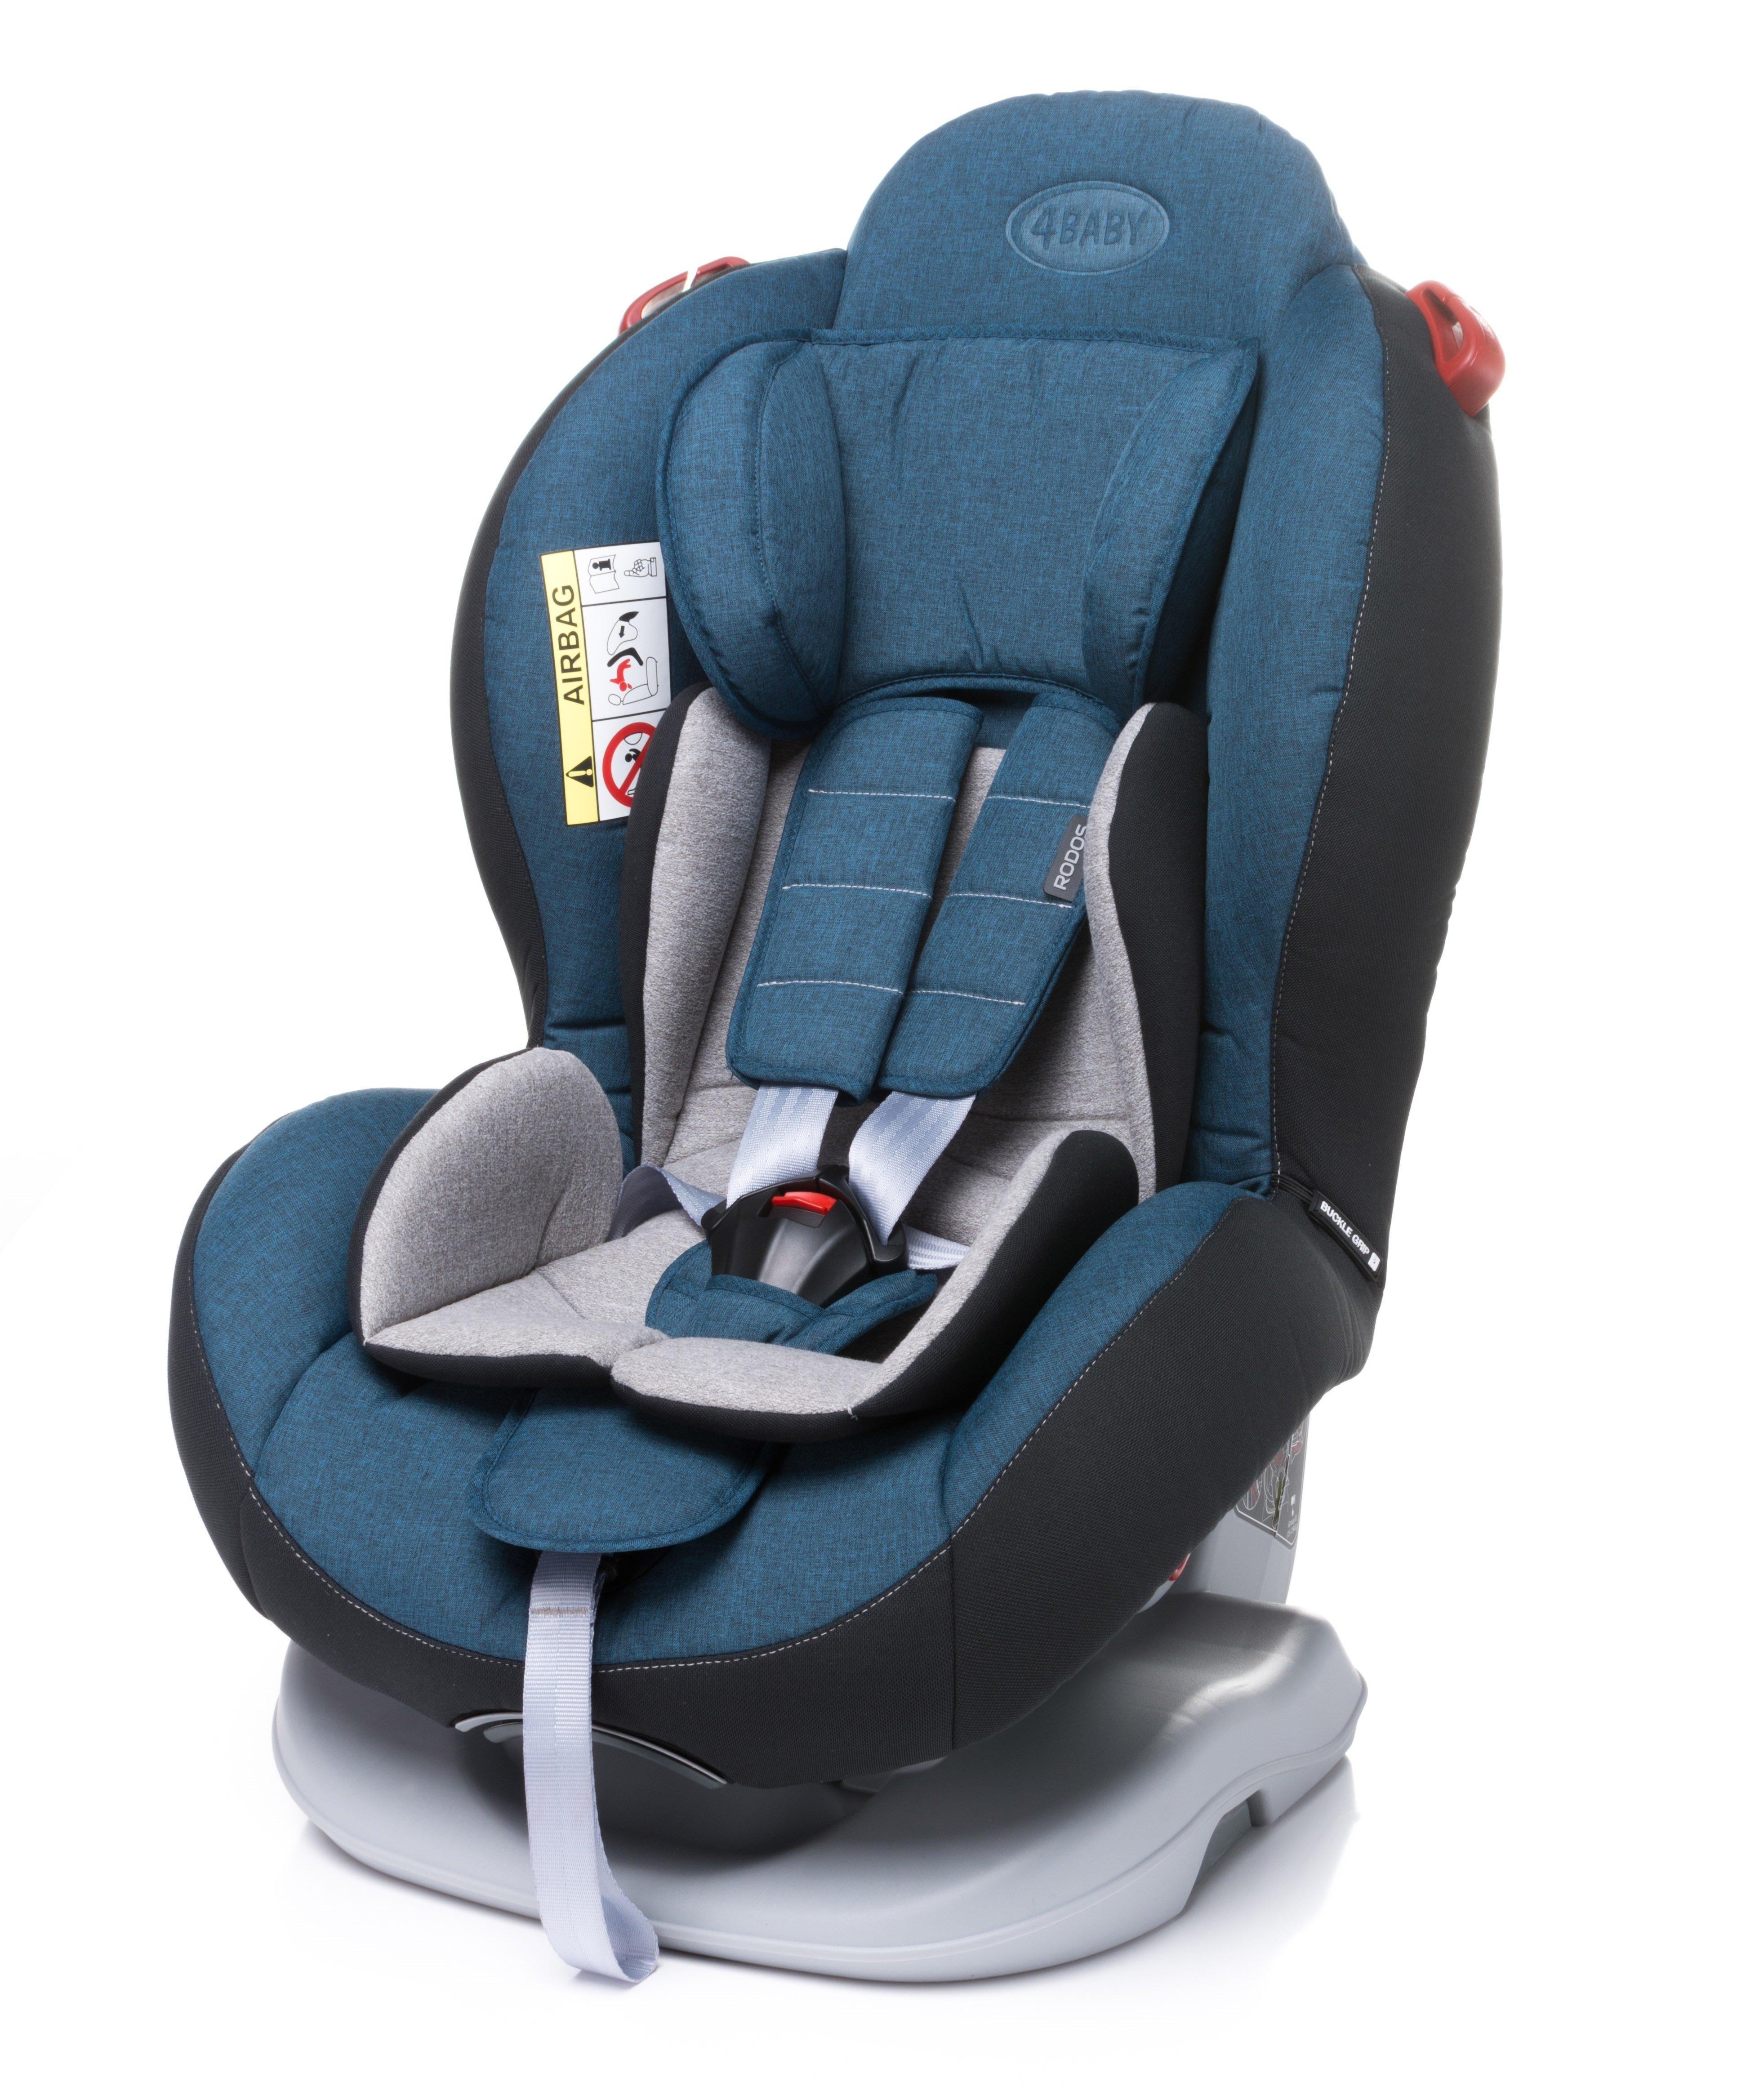 Bērnu autosēdeklis 0-25 kg 4BABY RODOS navy blue